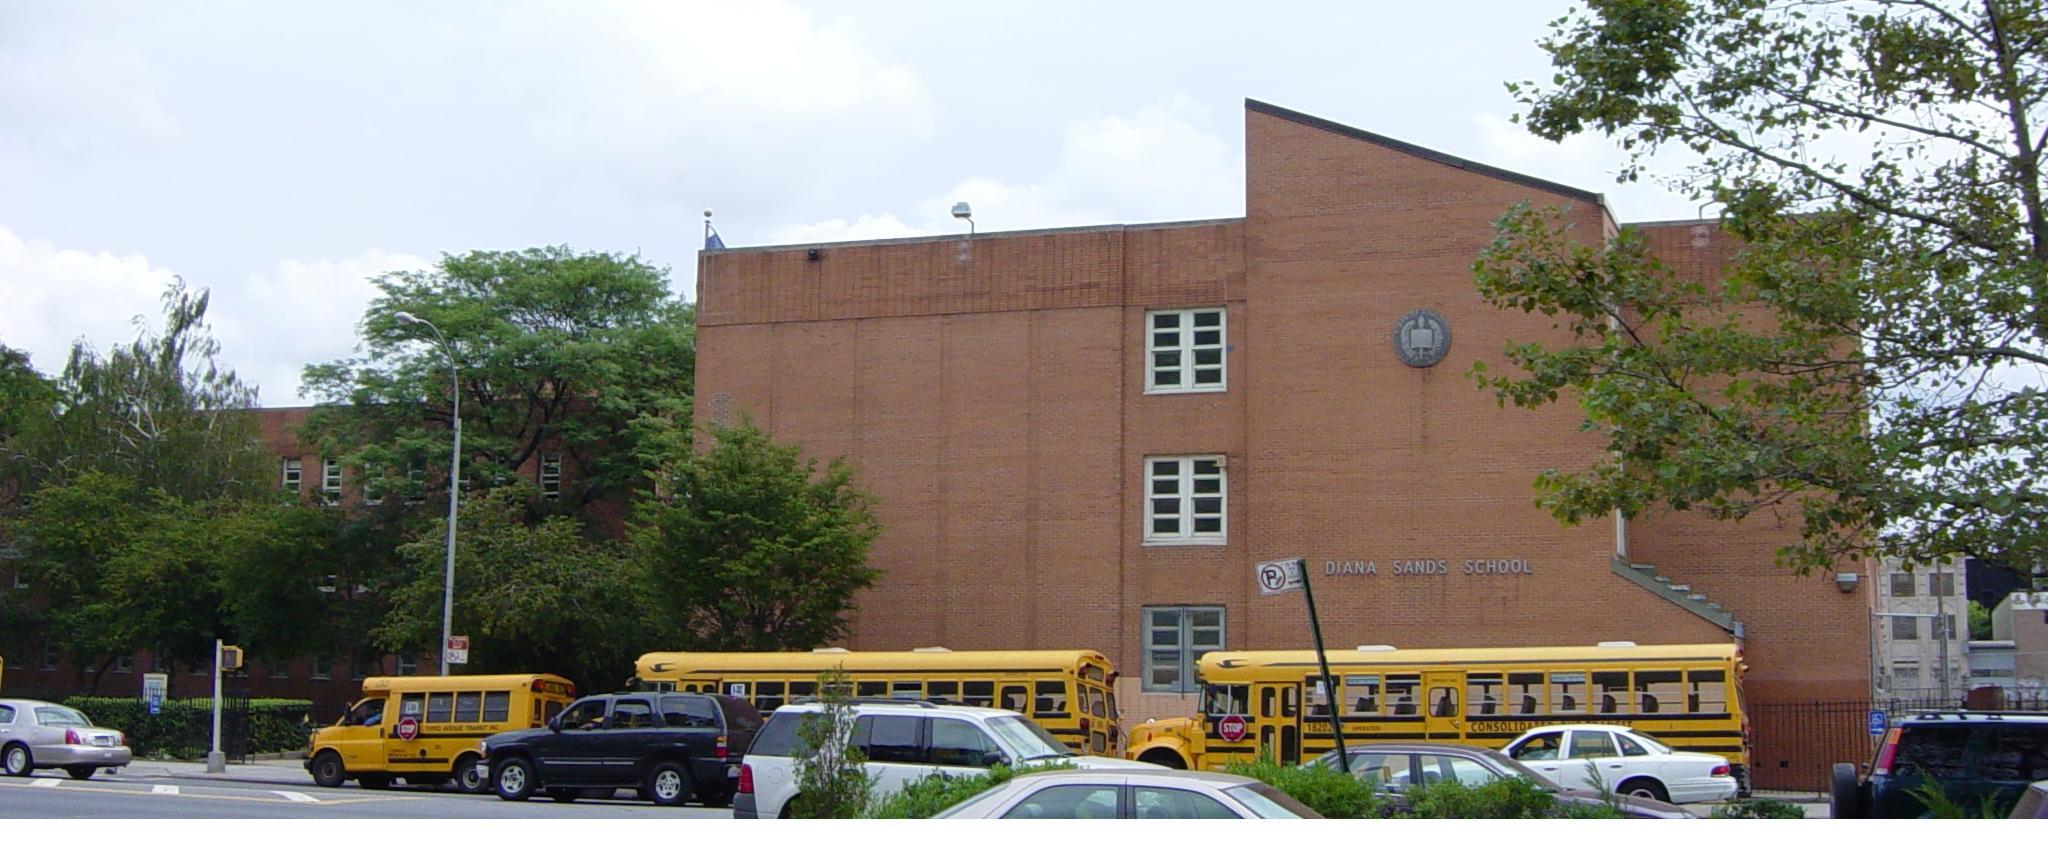 IS-147 Bronx